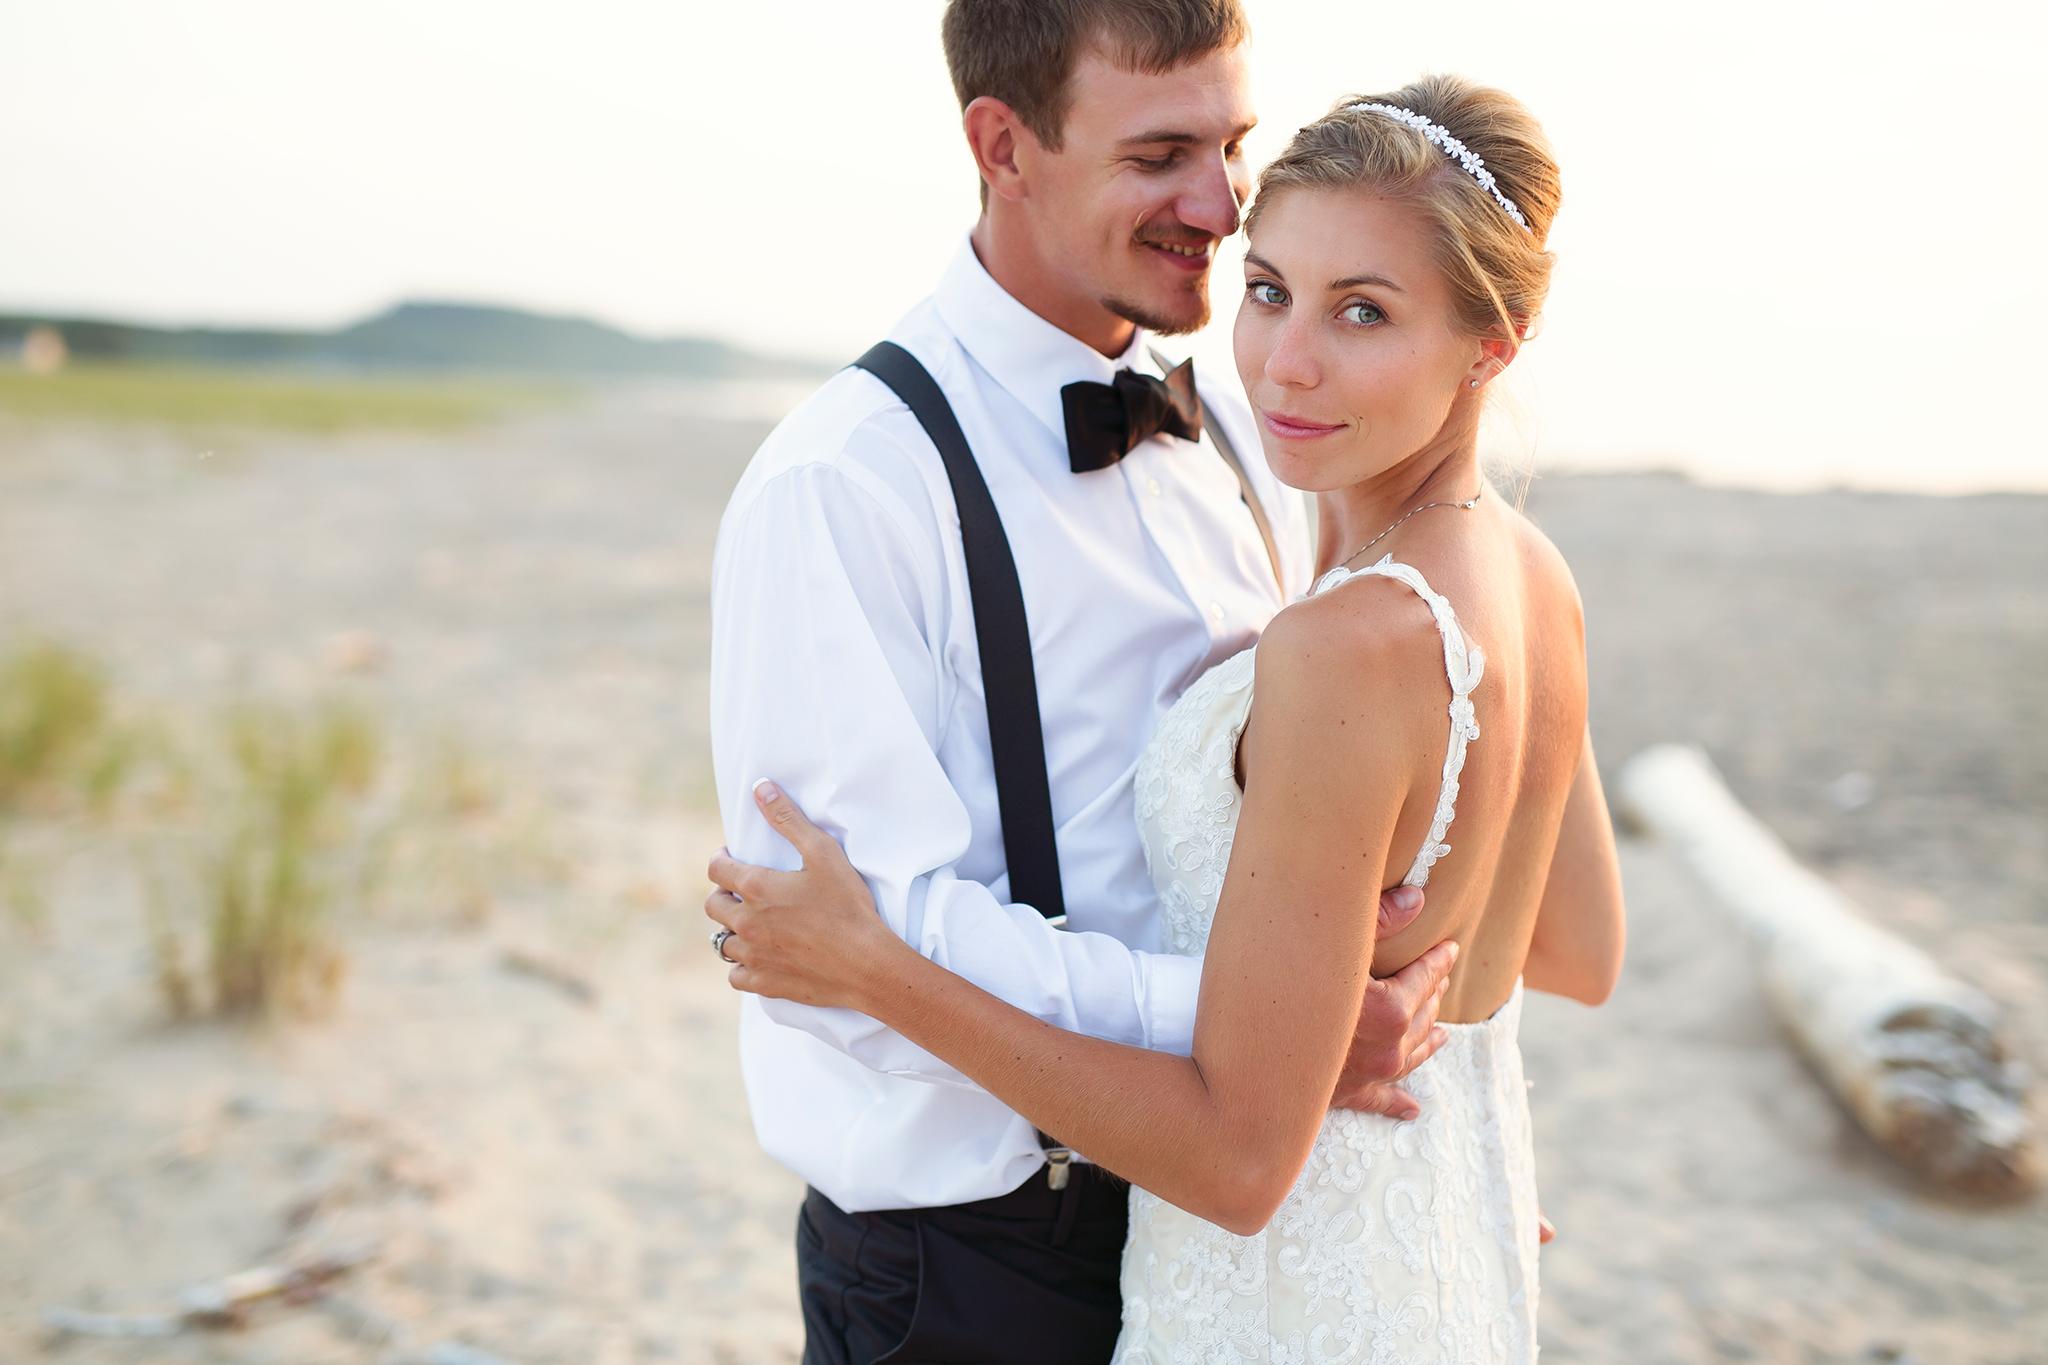 Rockhill-Studio-Lake-Superior-Upper-Peninsula-Michigan-Wedding-Photographer-Destination-Wedding-Rockhill-Studio-Marquette.jpg